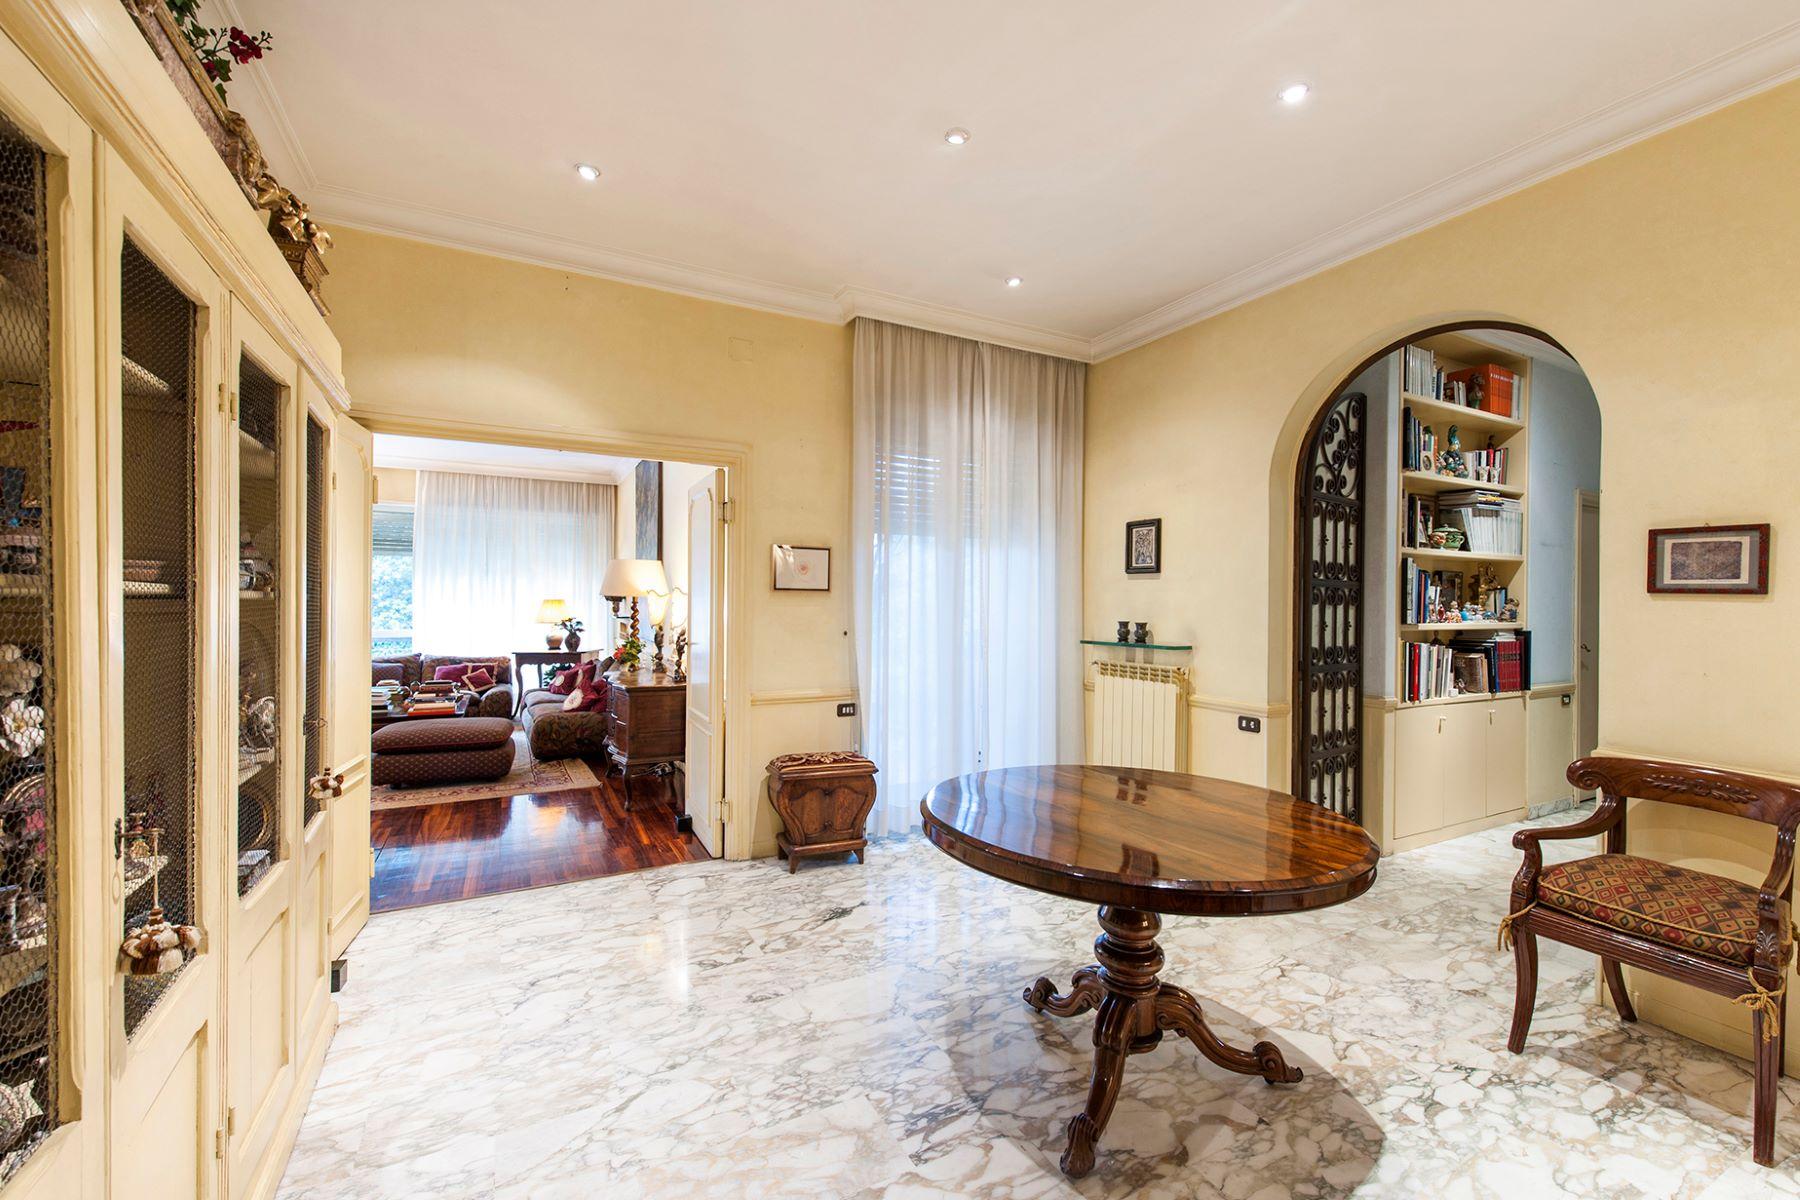 Apartamento por un Venta en Elegant apartment in Viale Cortina d'Ampezzo Rome, Roma 00135 Italia